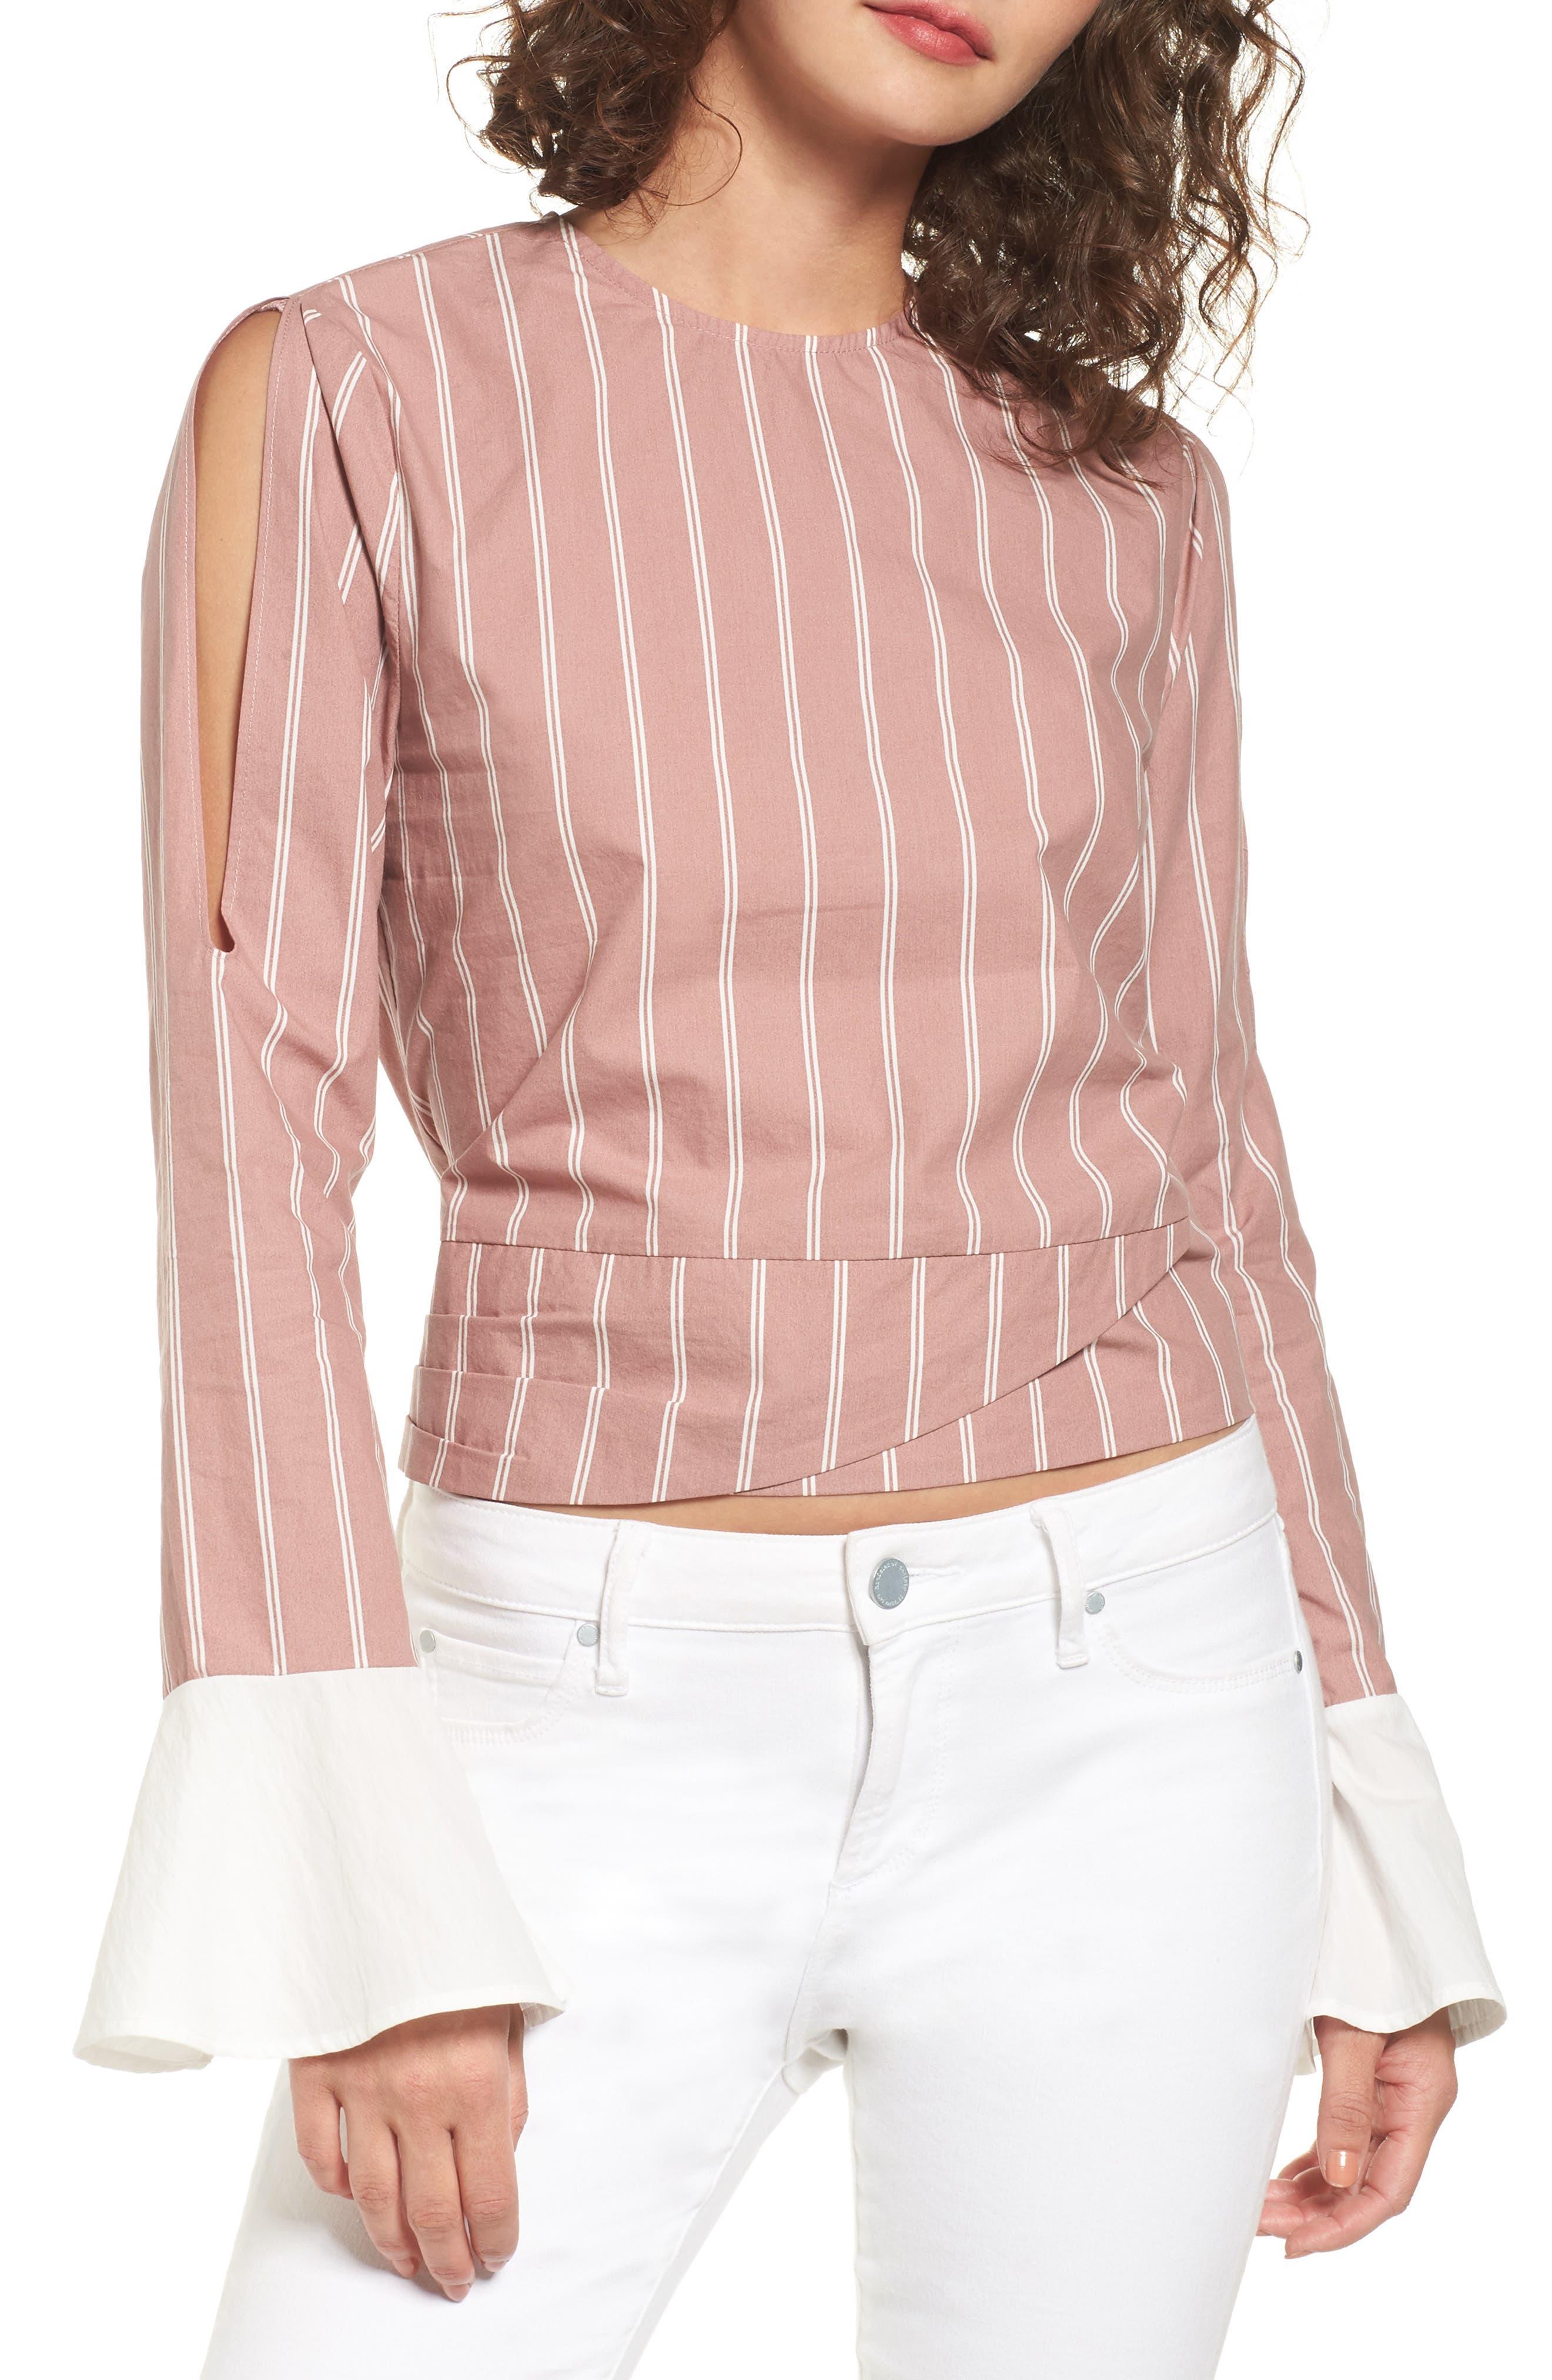 EVIDNT Stripe Cotton Tie Waist Top